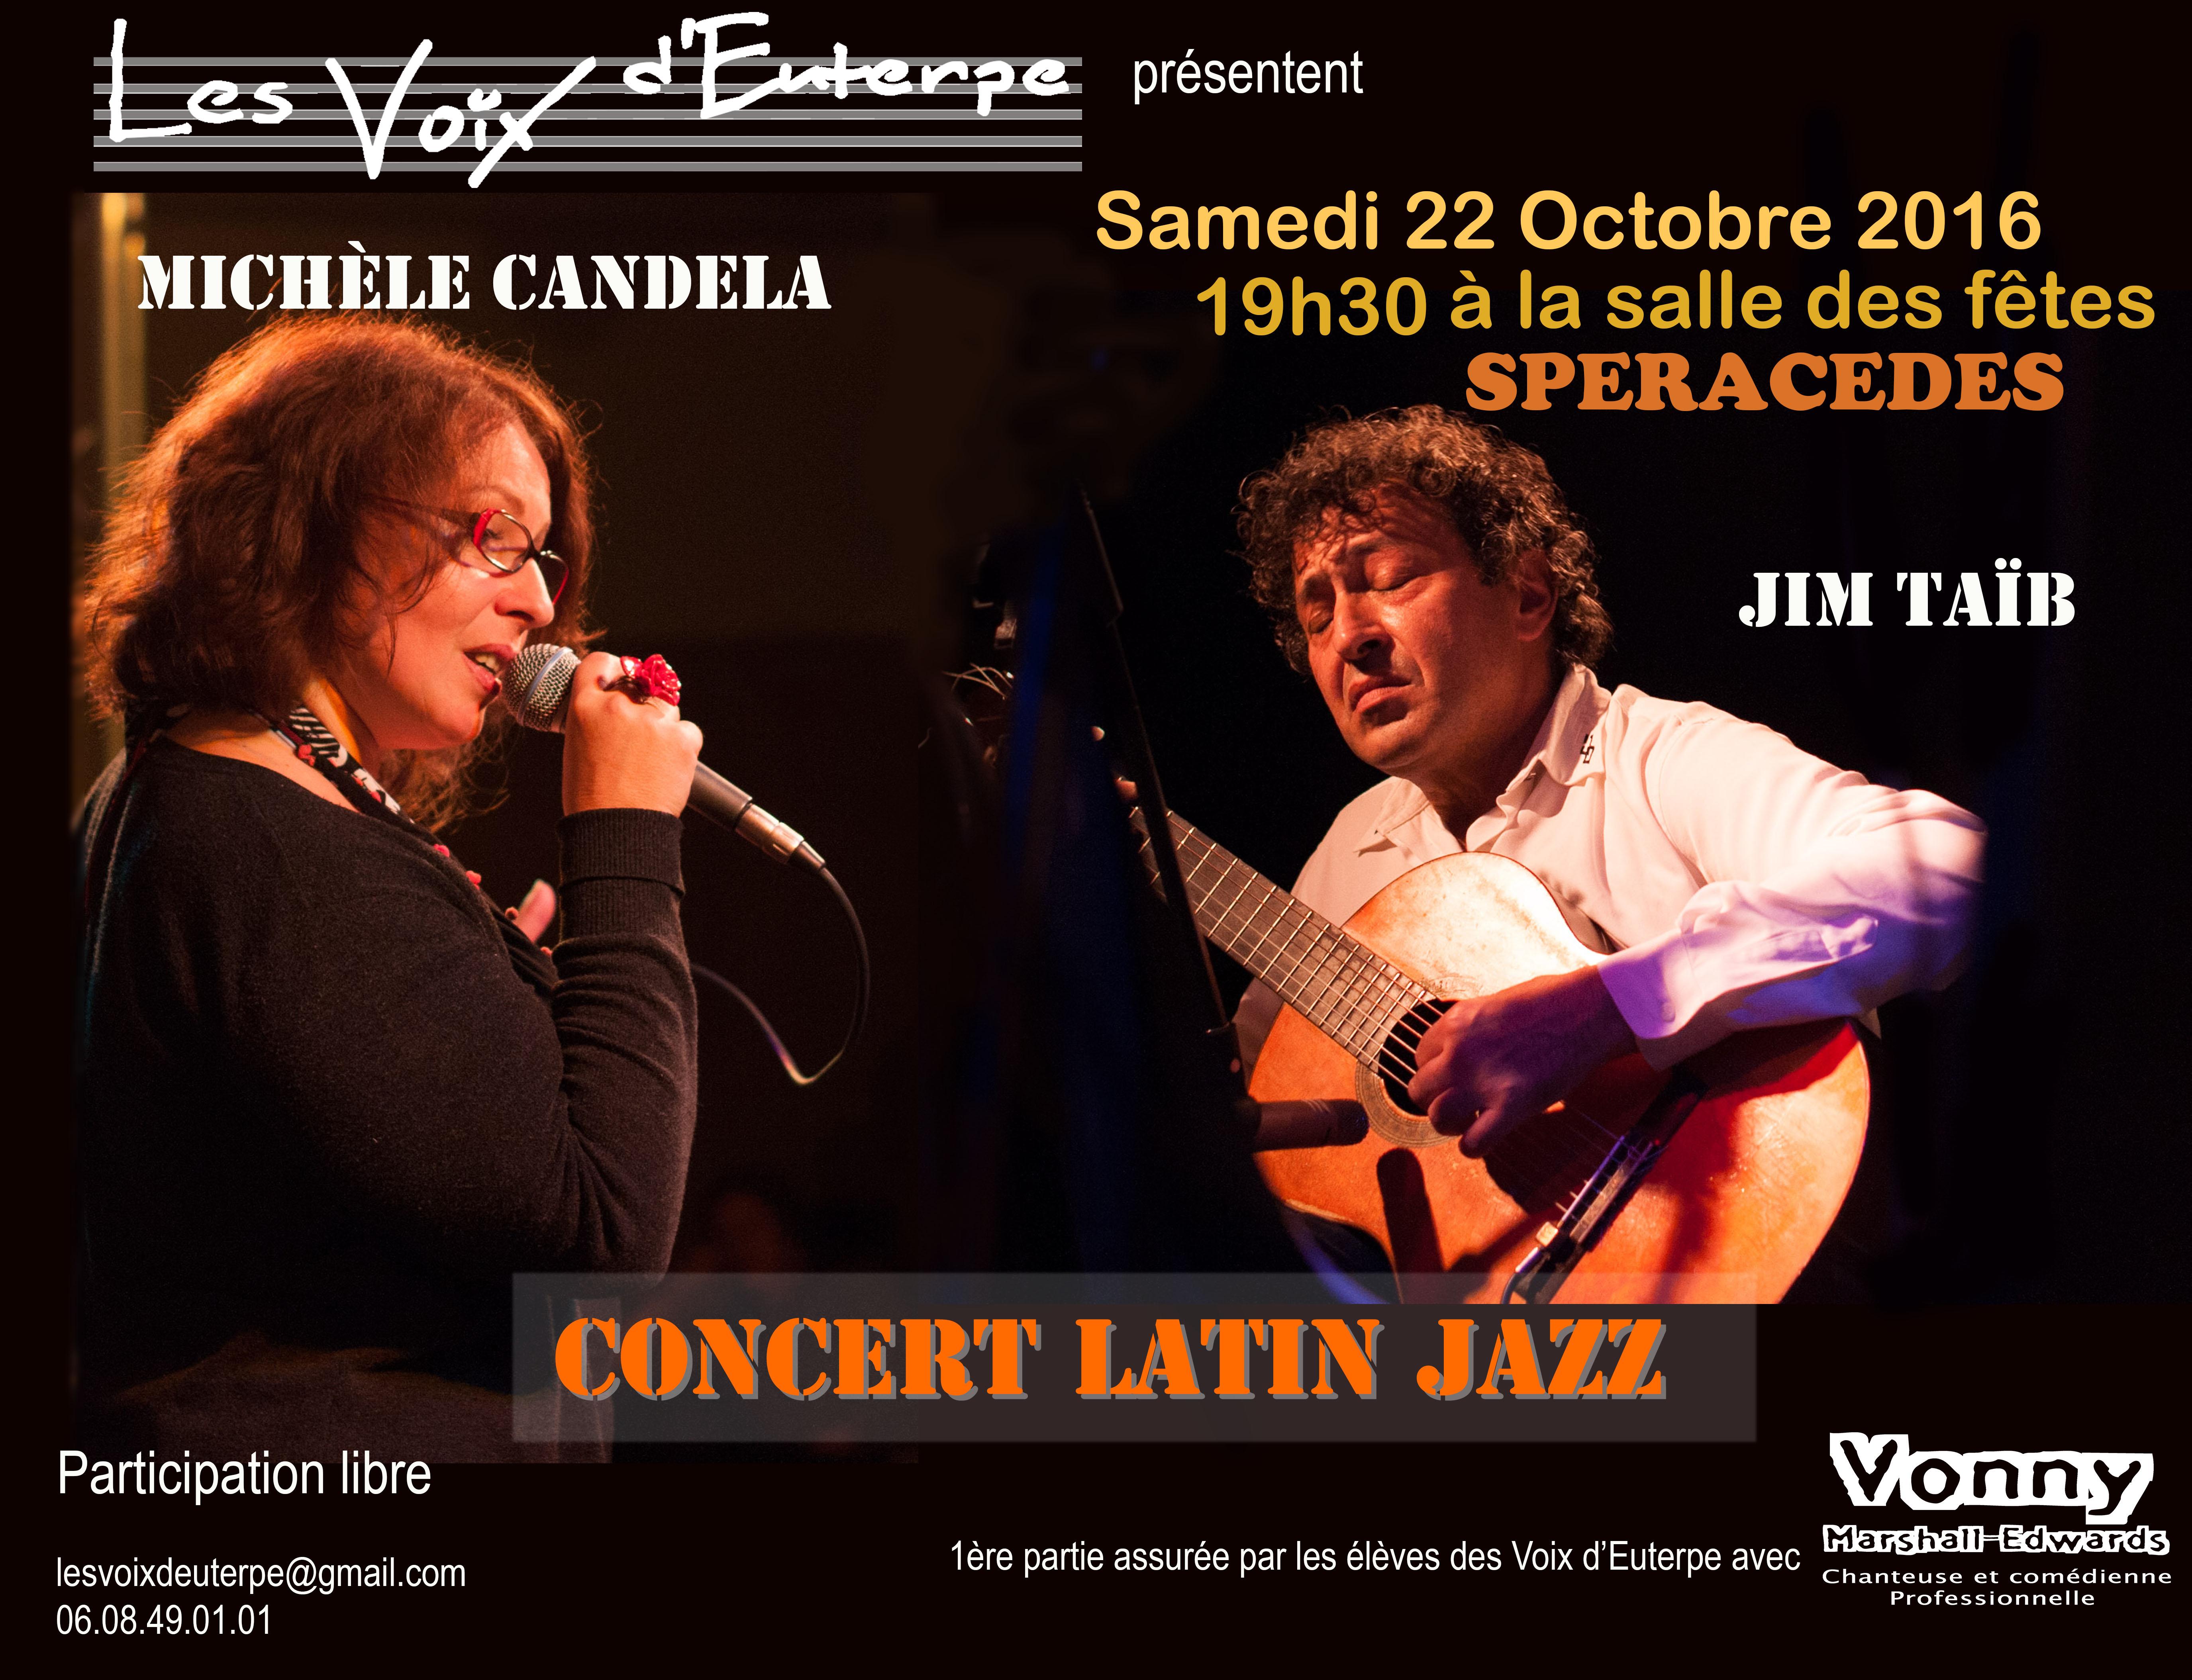 Affiche LatinJazz_Michele _Candela_LVE22